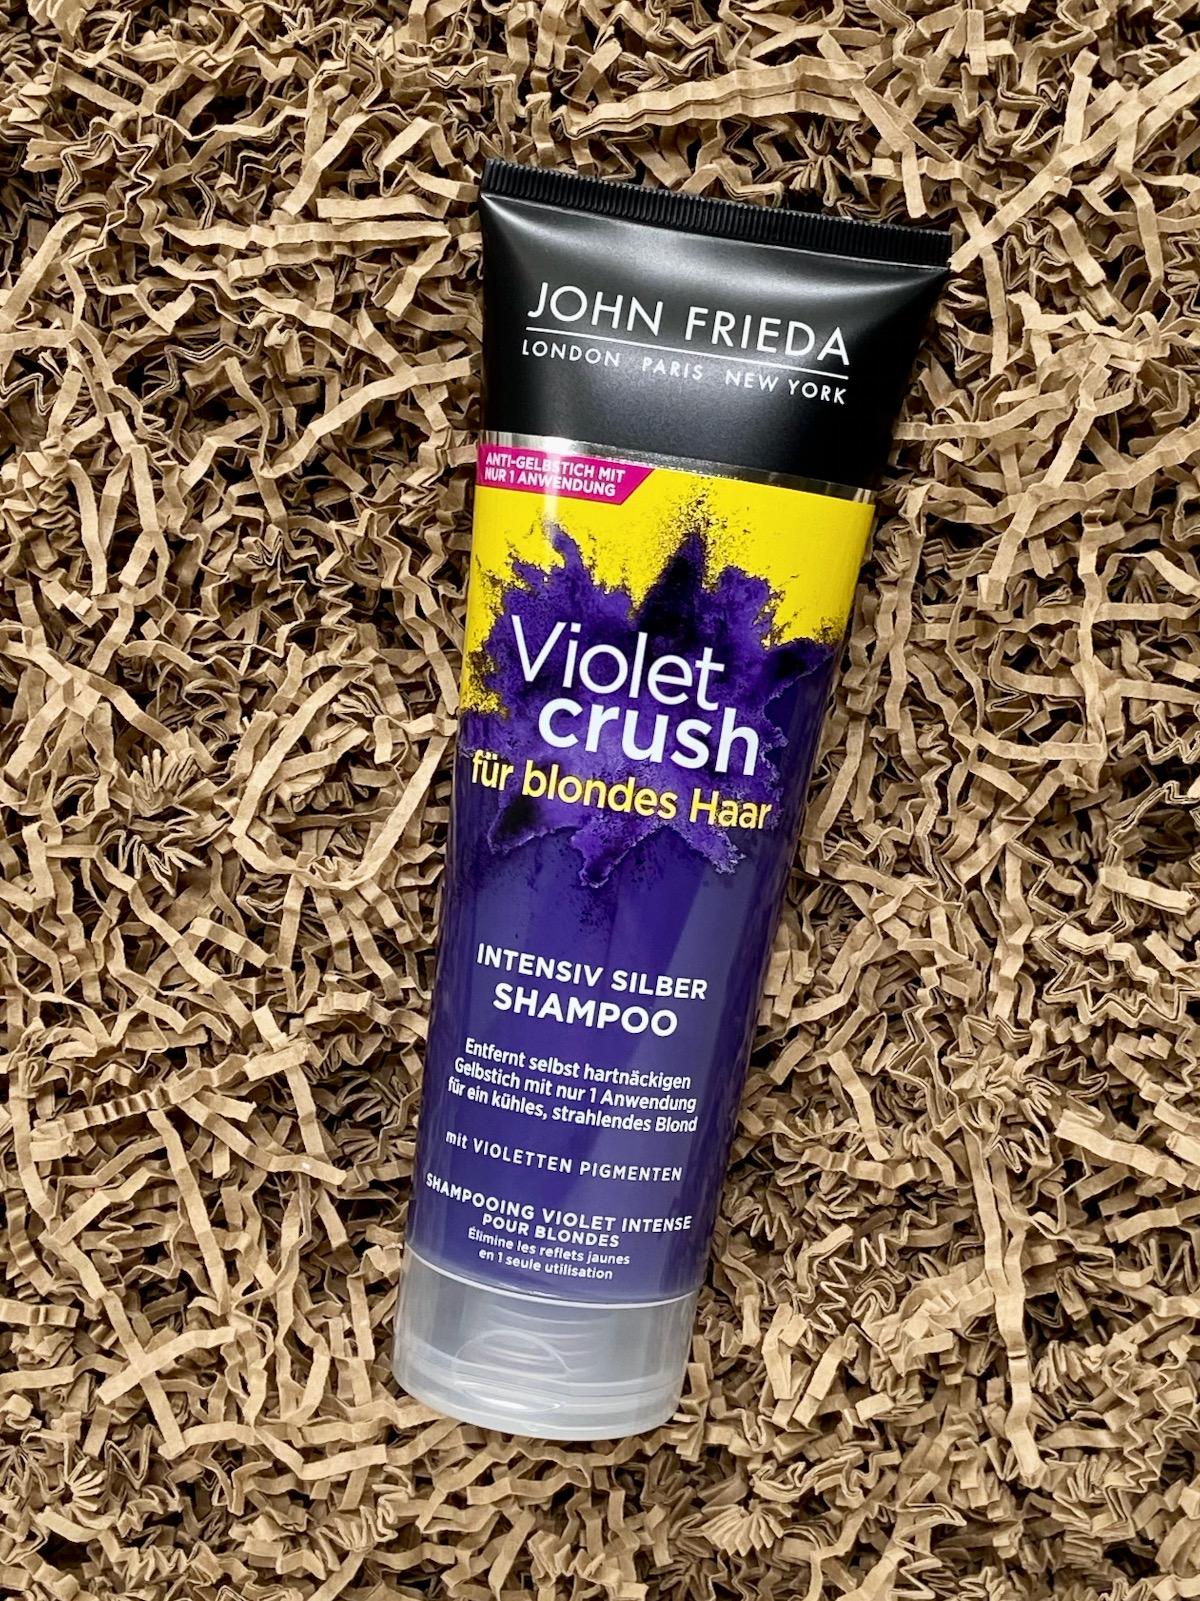 John Frieda Violet Crush Intensiv Silber Shampoo Tube